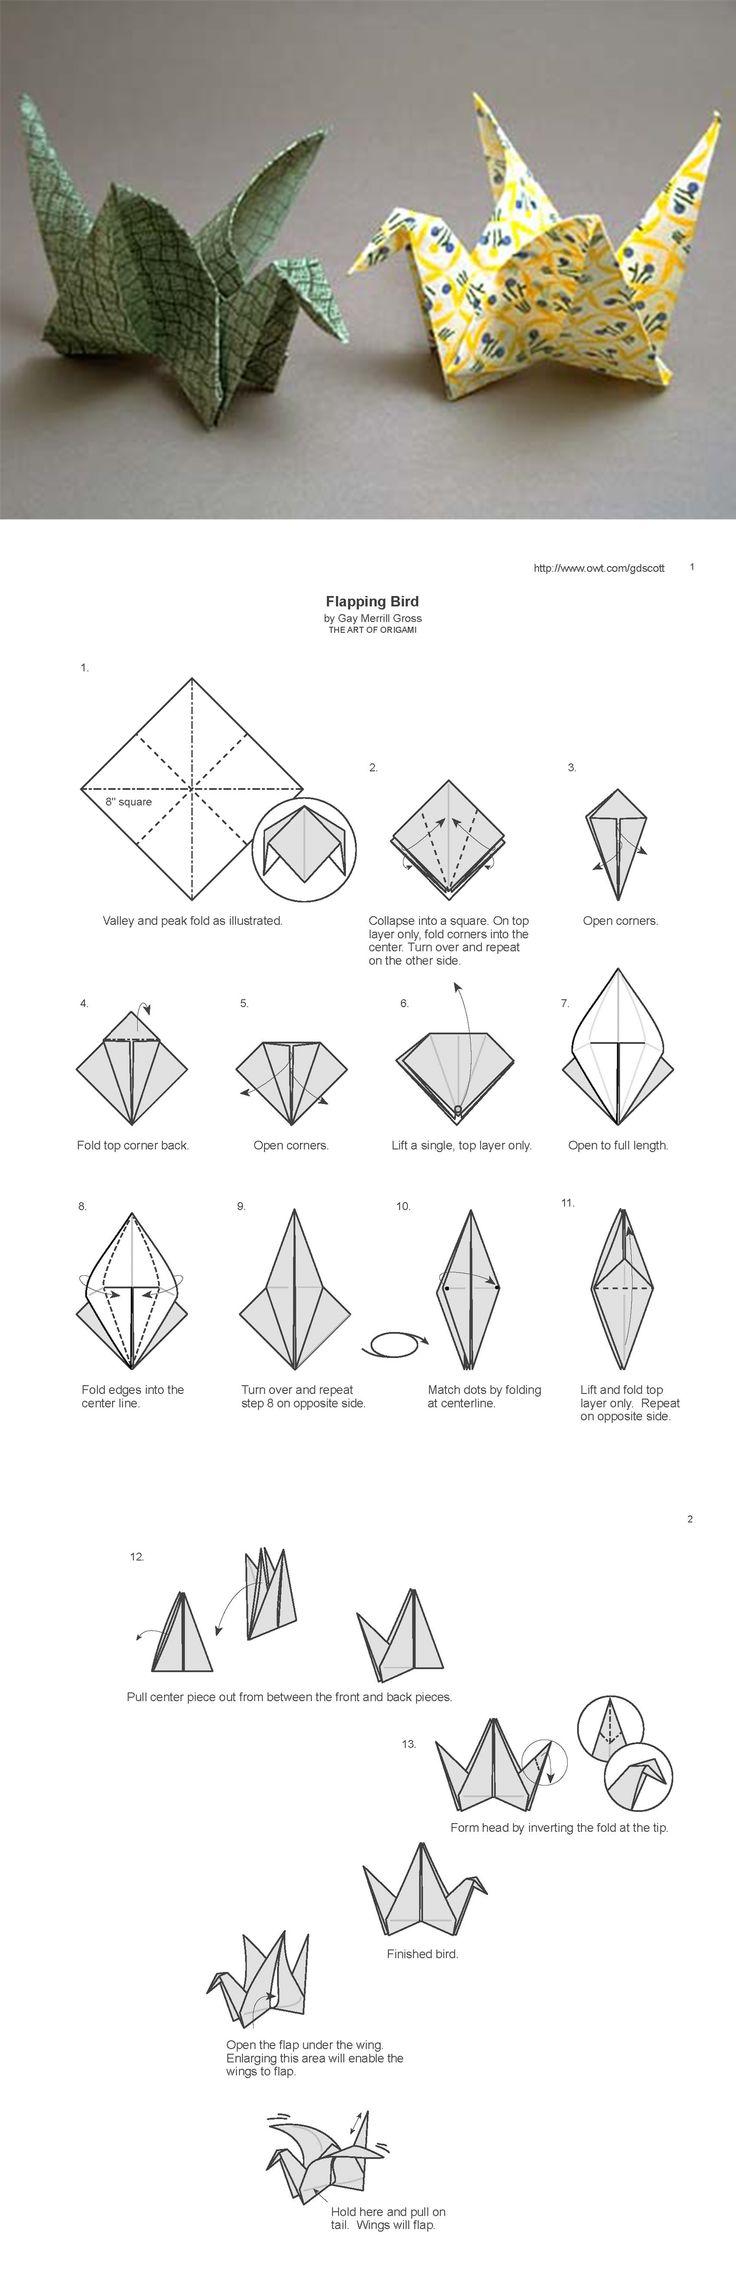 Origami flatternder Vogel / flapping bird